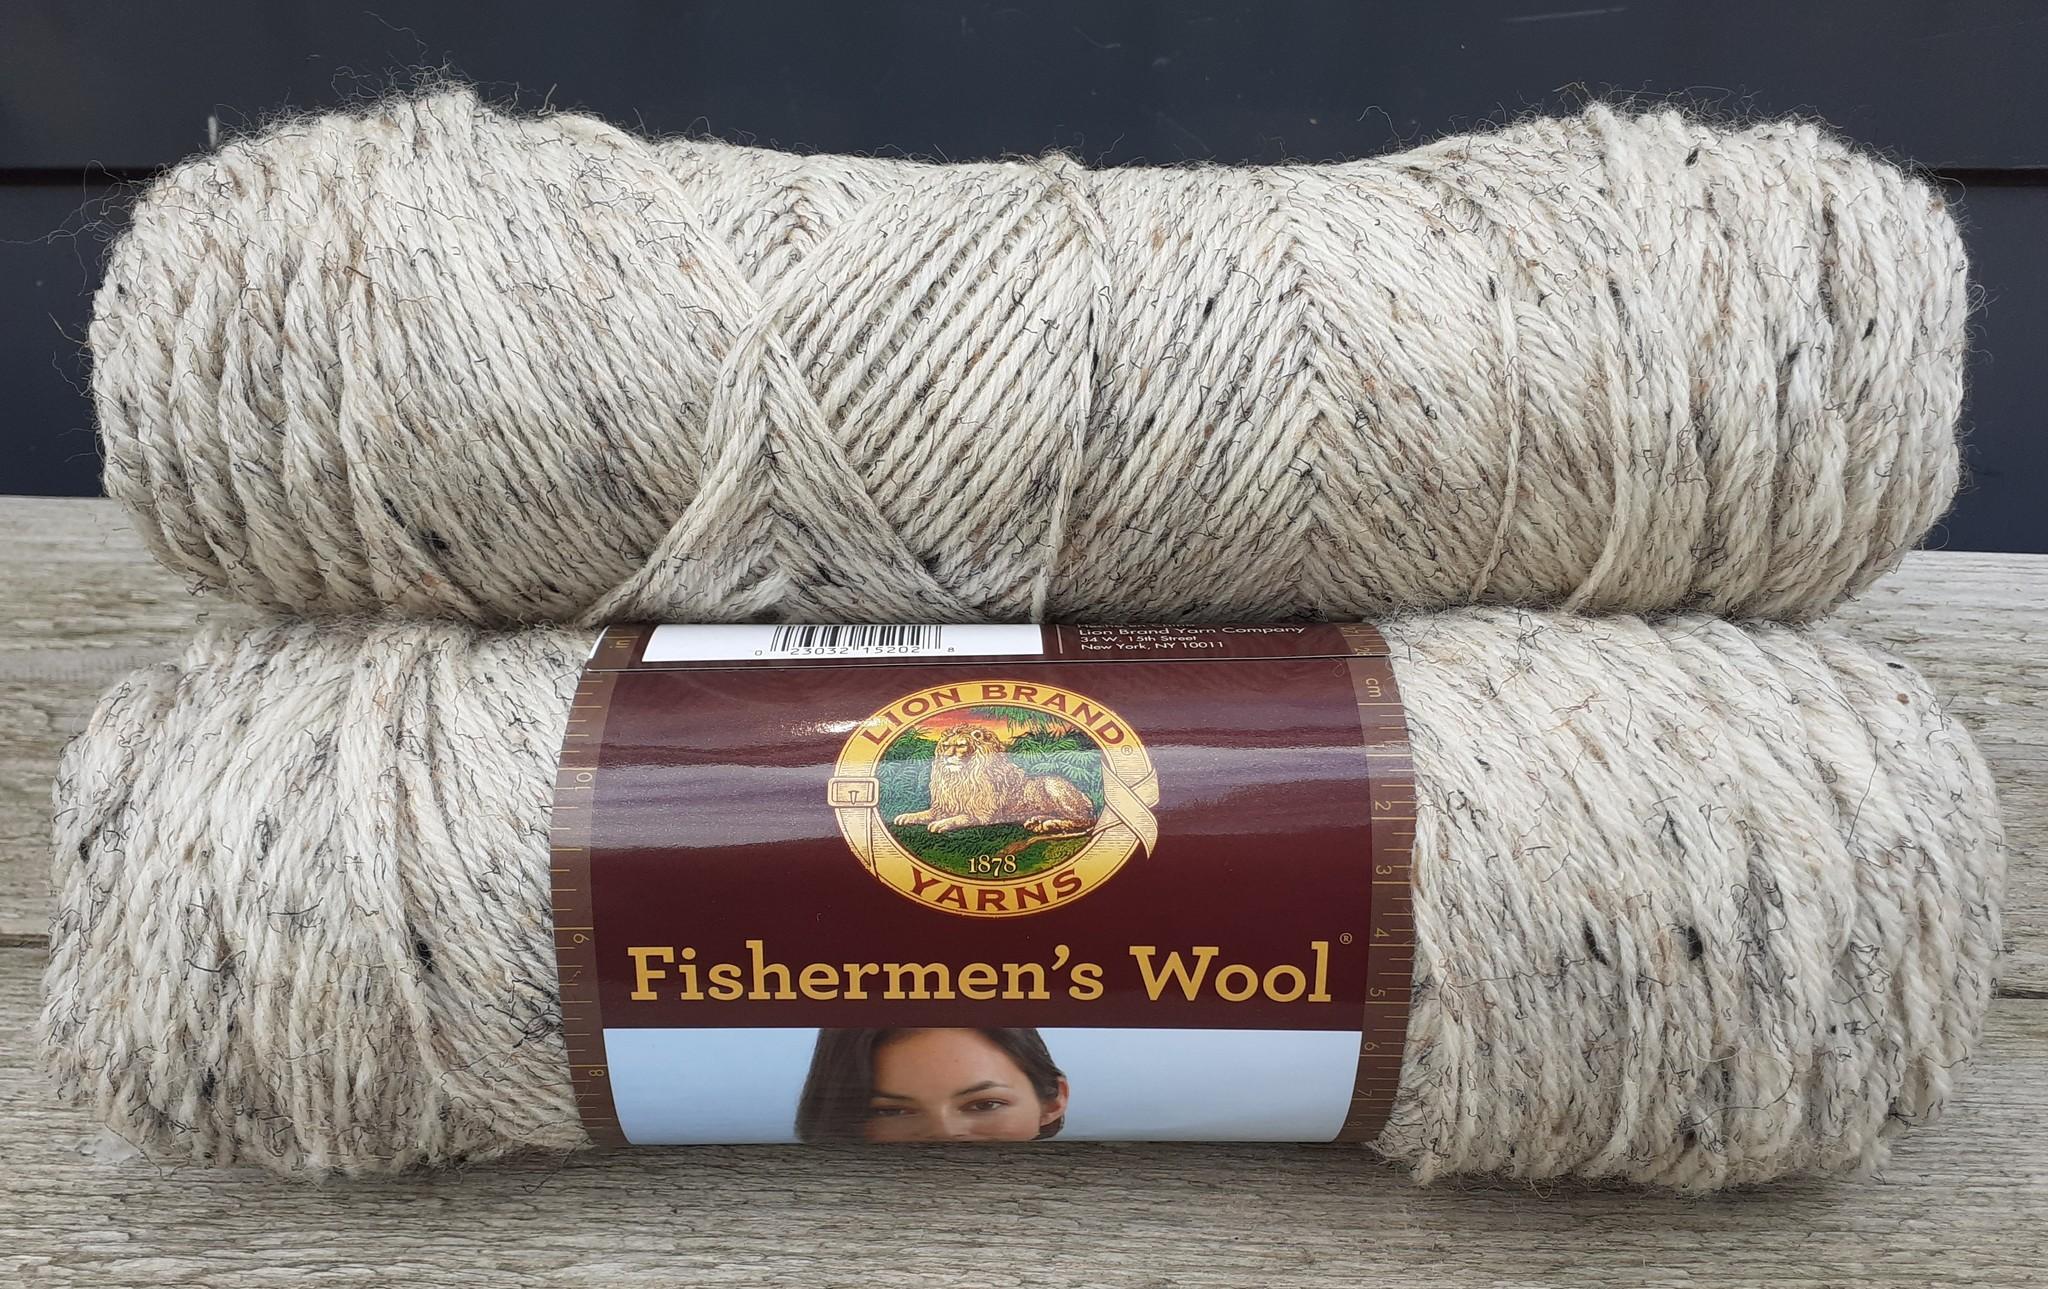 Lion Brand Fishermen'S Wool - 202 - Birch Tweed